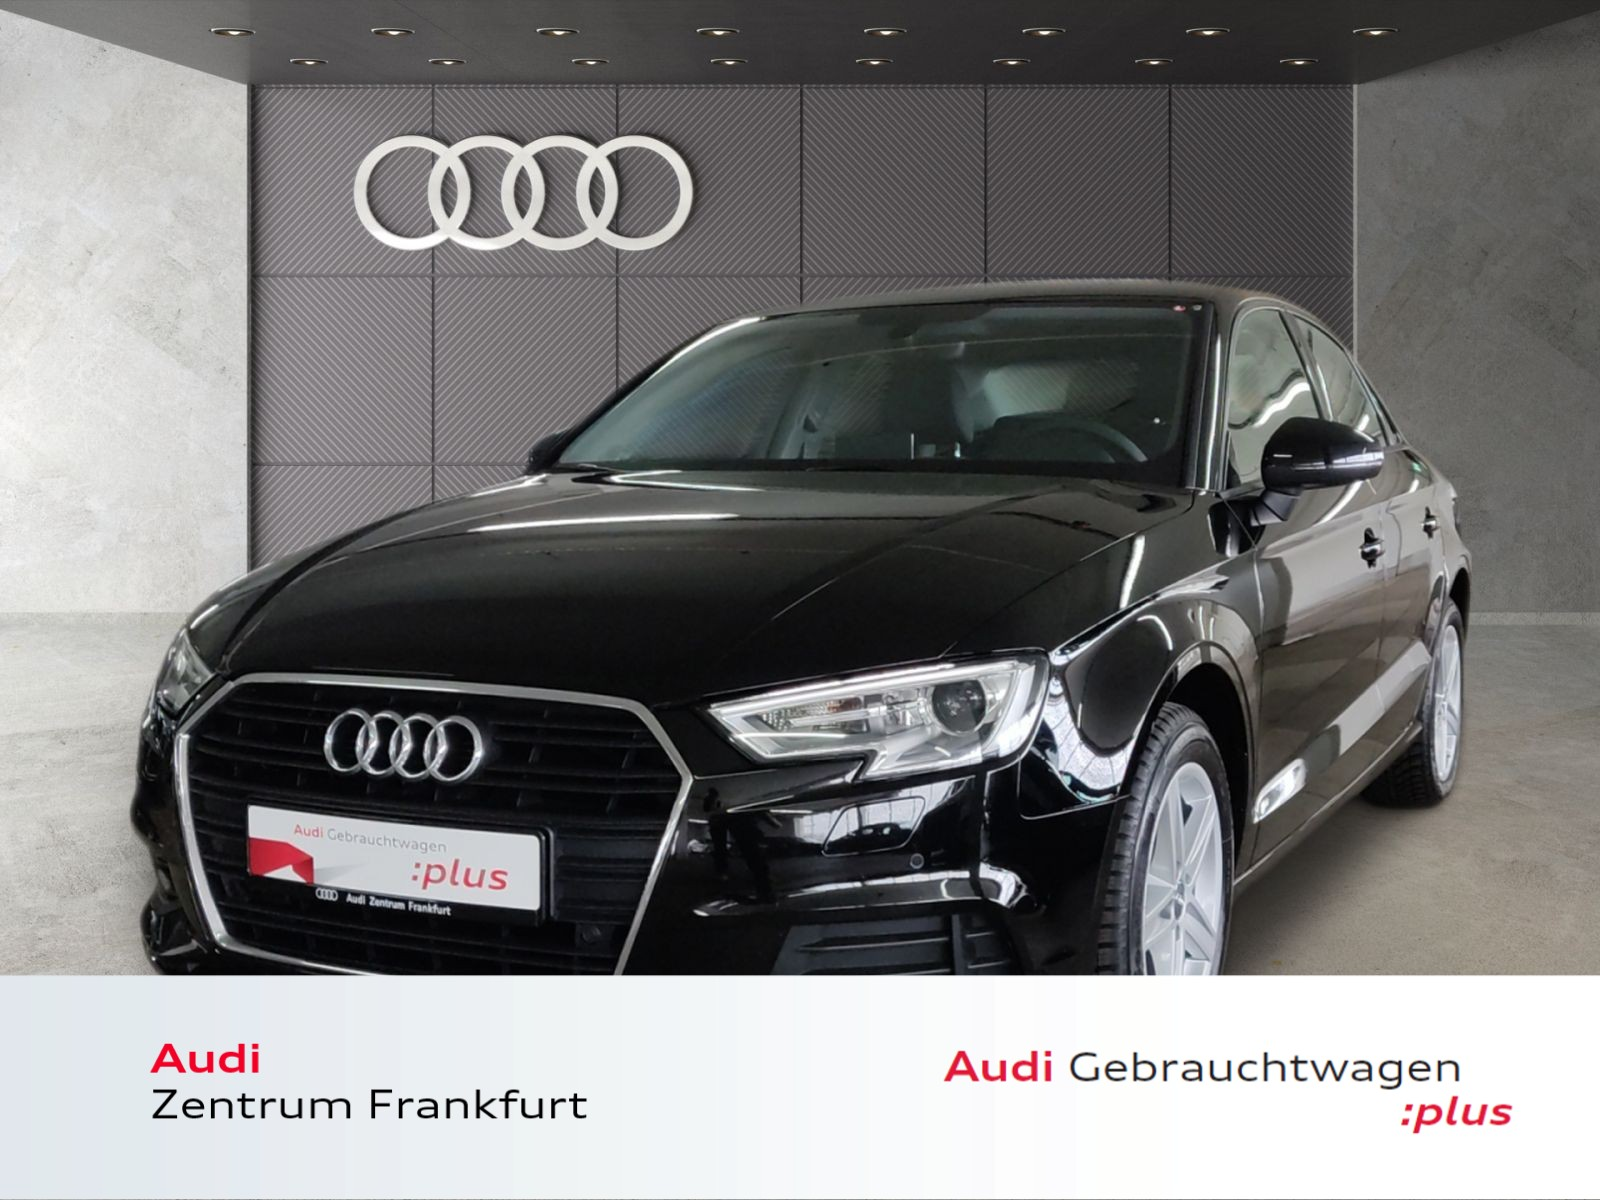 Audi A3 Limousine 1.0 TFSI S tronic Navi Xenon PDC Sitzheizung, Jahr 2018, Benzin